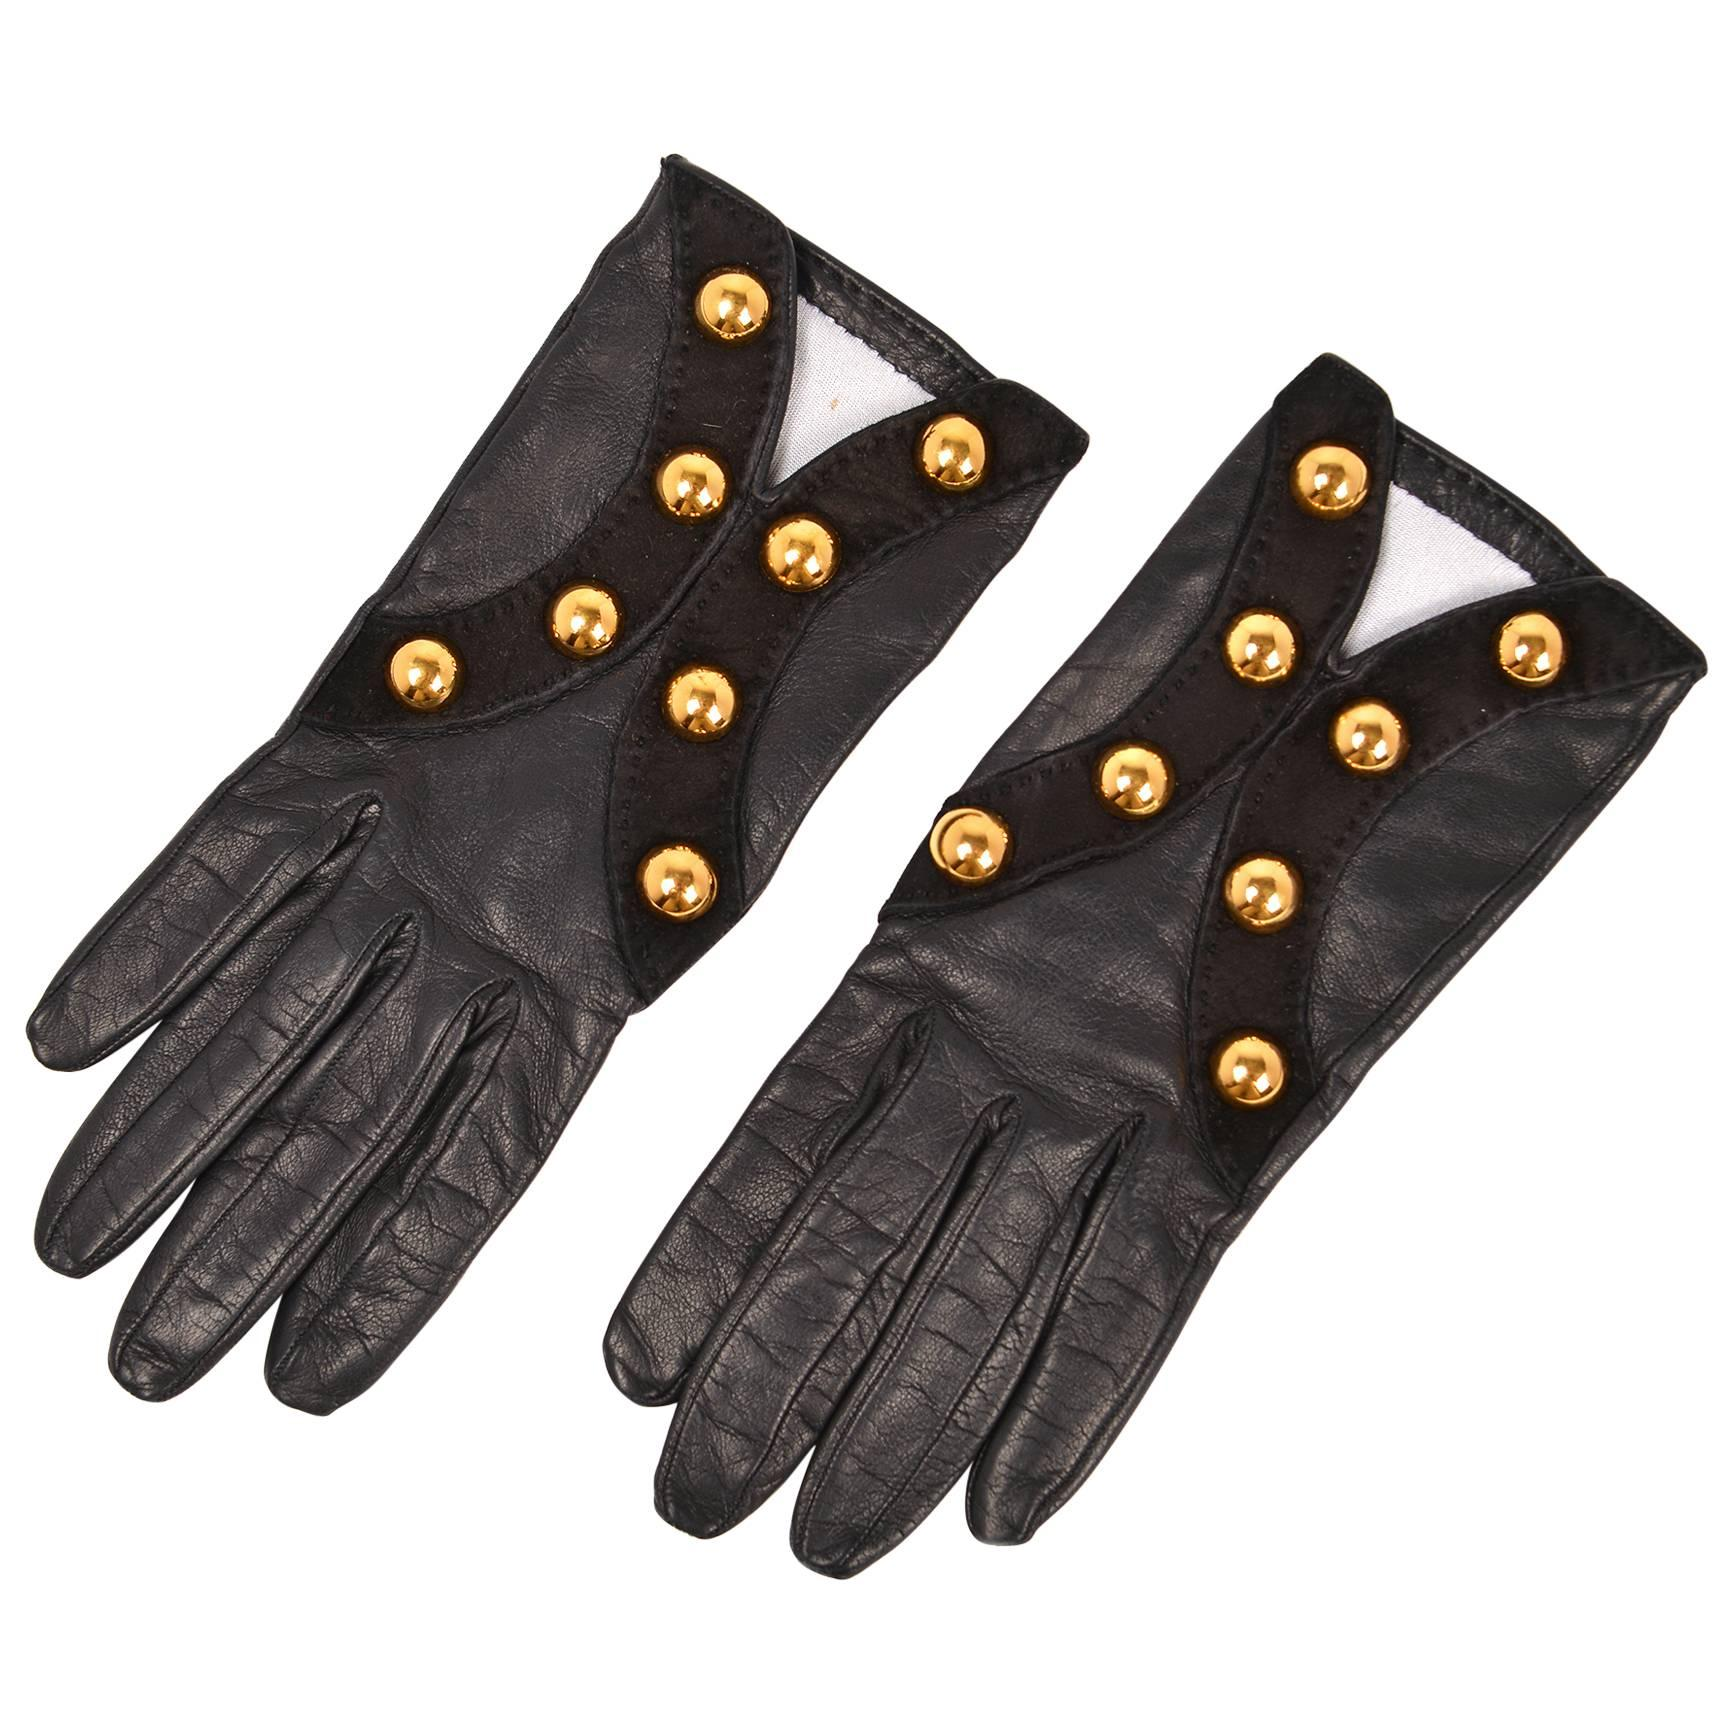 Hermes Paris Vintage Black Leather Gloves